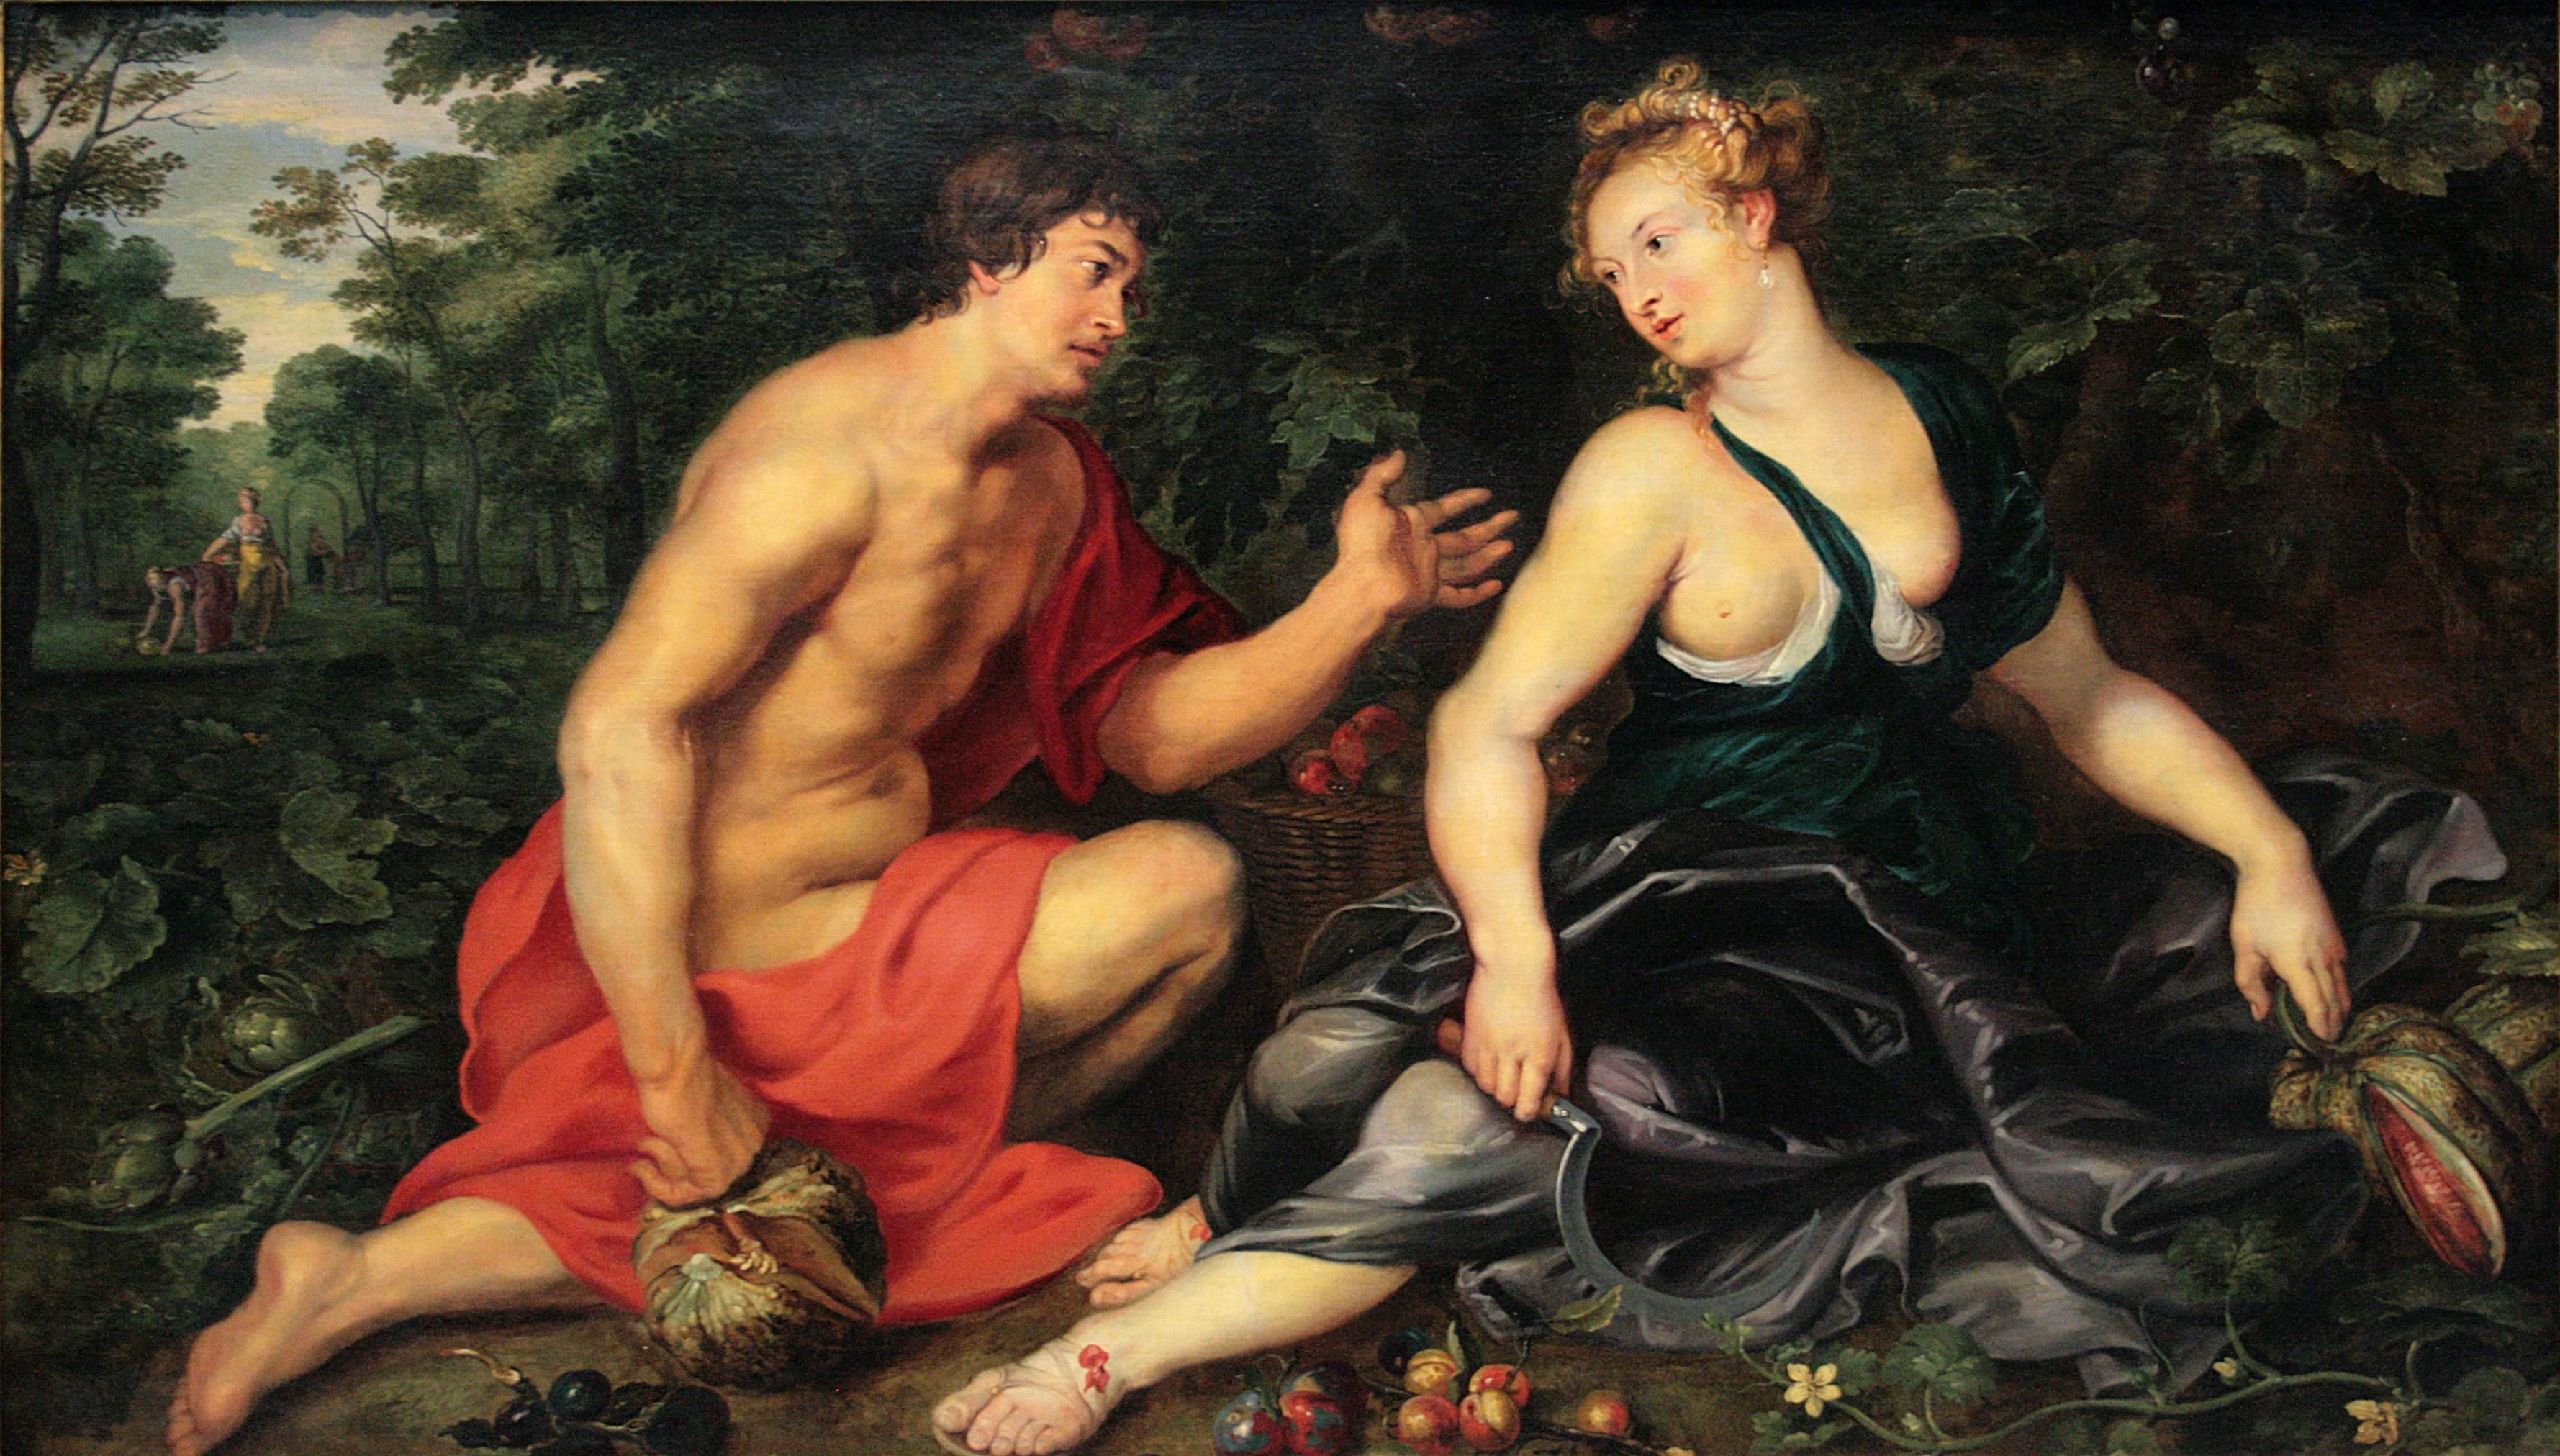 Peter Paul Rubens, Vertumno e Pomona, 1617